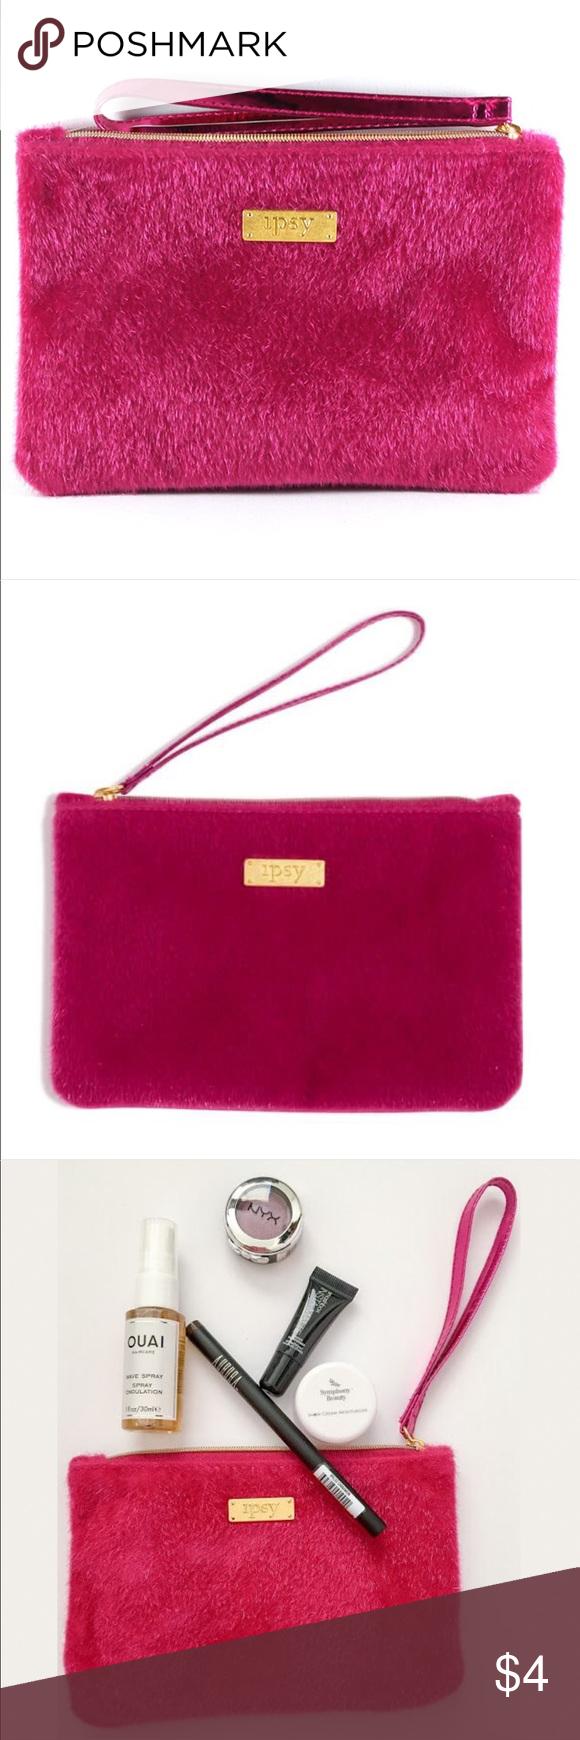 "7e22bc580b ipsy ""Carpe P.M."" Pink Fur Glam Bag Makeup Case ipsy ""Carpe P.M."""